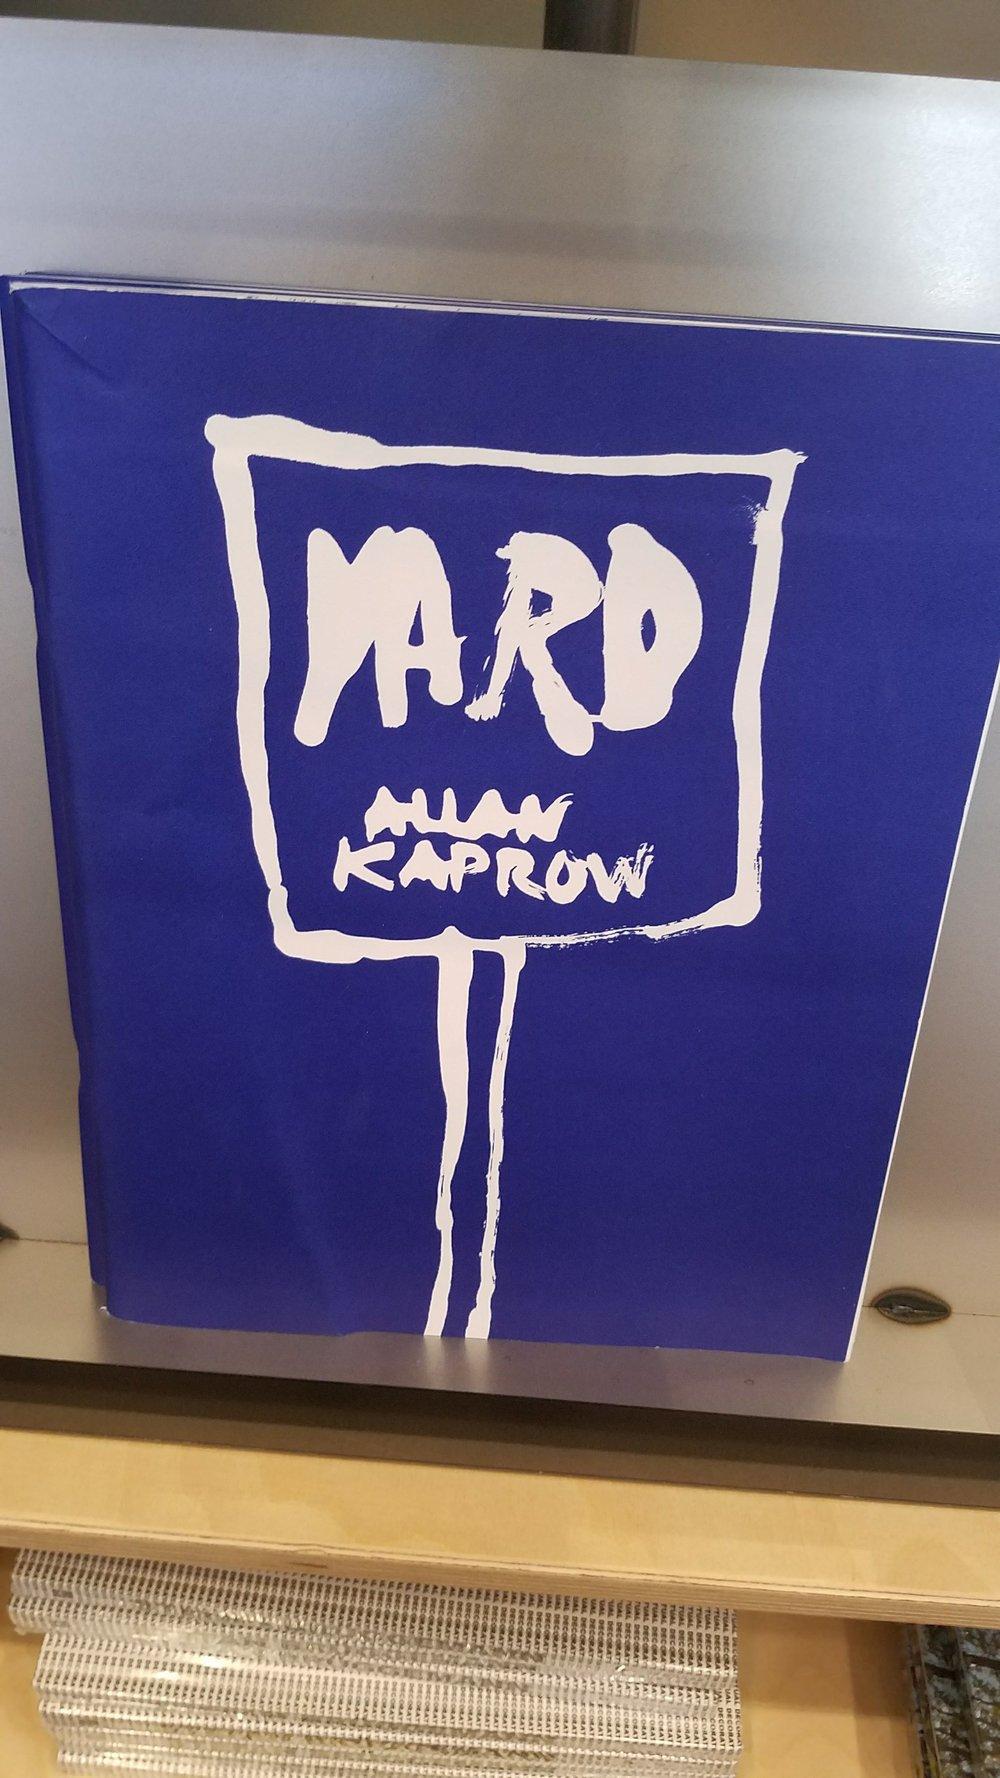 Allan Kaprow,  Yard , 1961, Courtesy Hauser & Wirth (Bookstore)